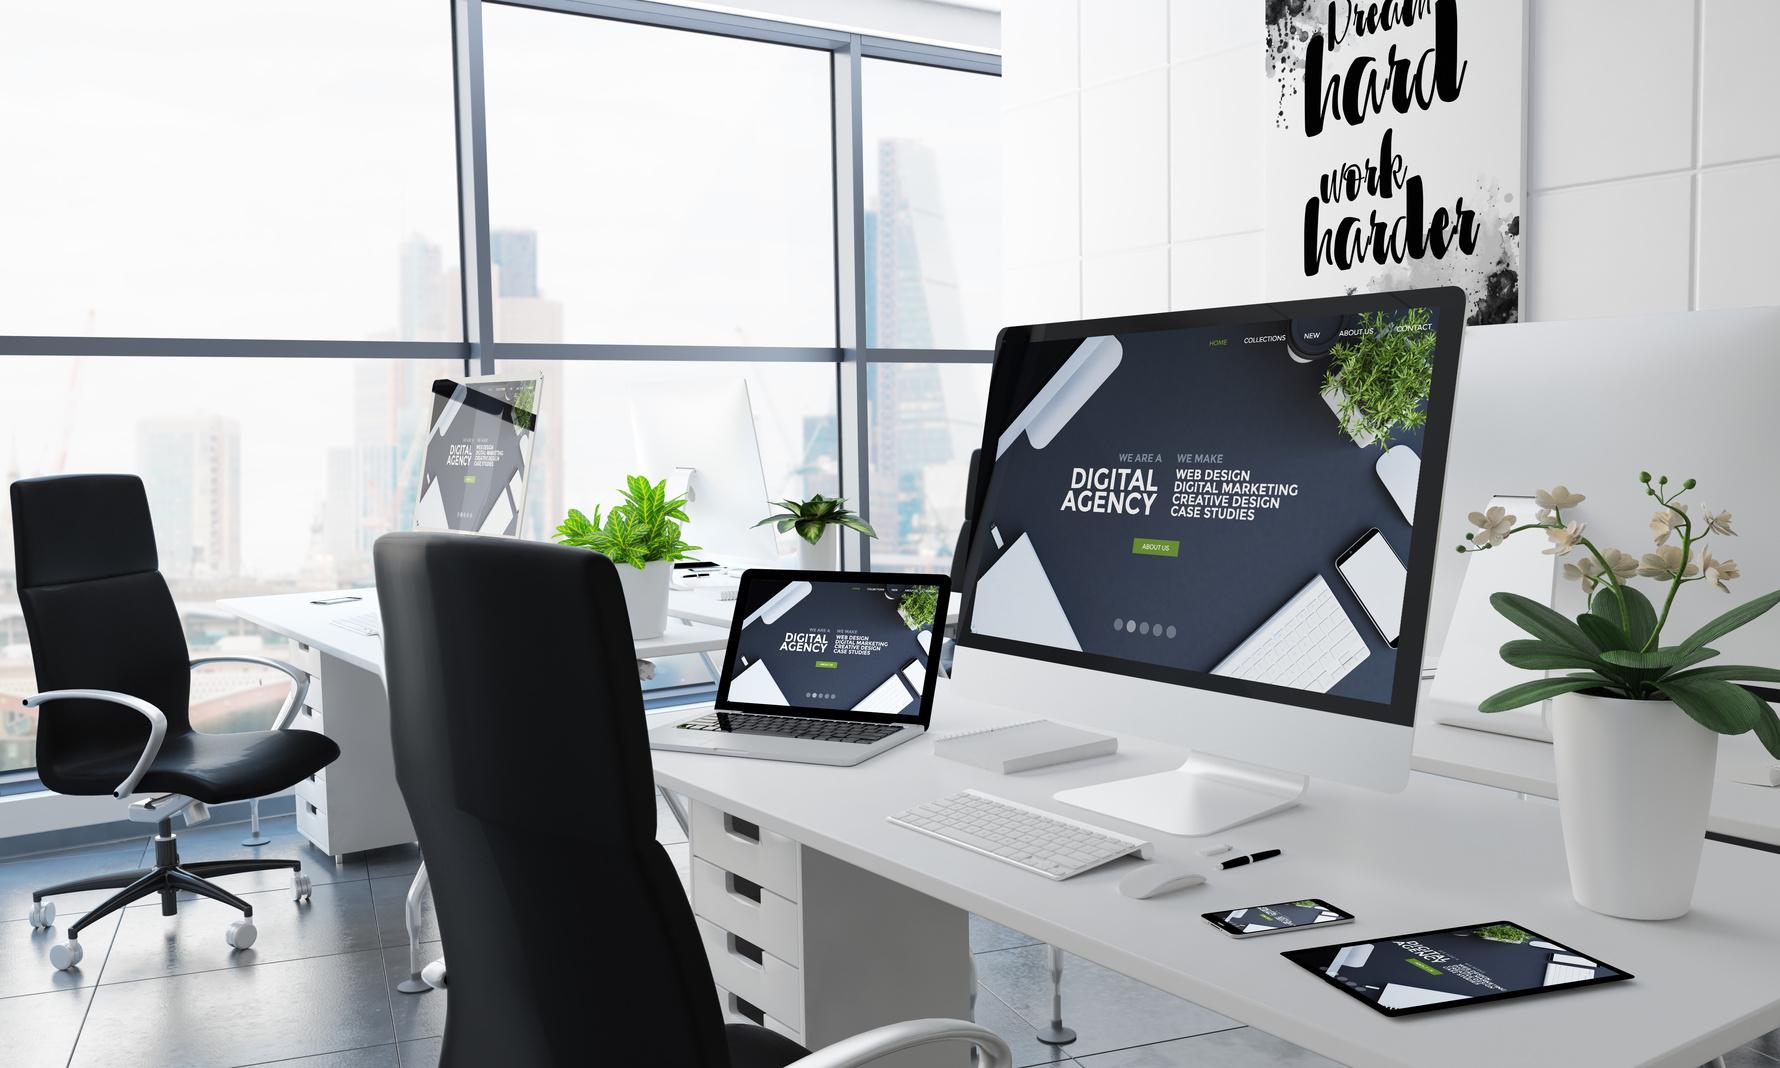 How to choose a marketing agency? Blog I Socjal Media Blog Nakatomi Advertising Agency